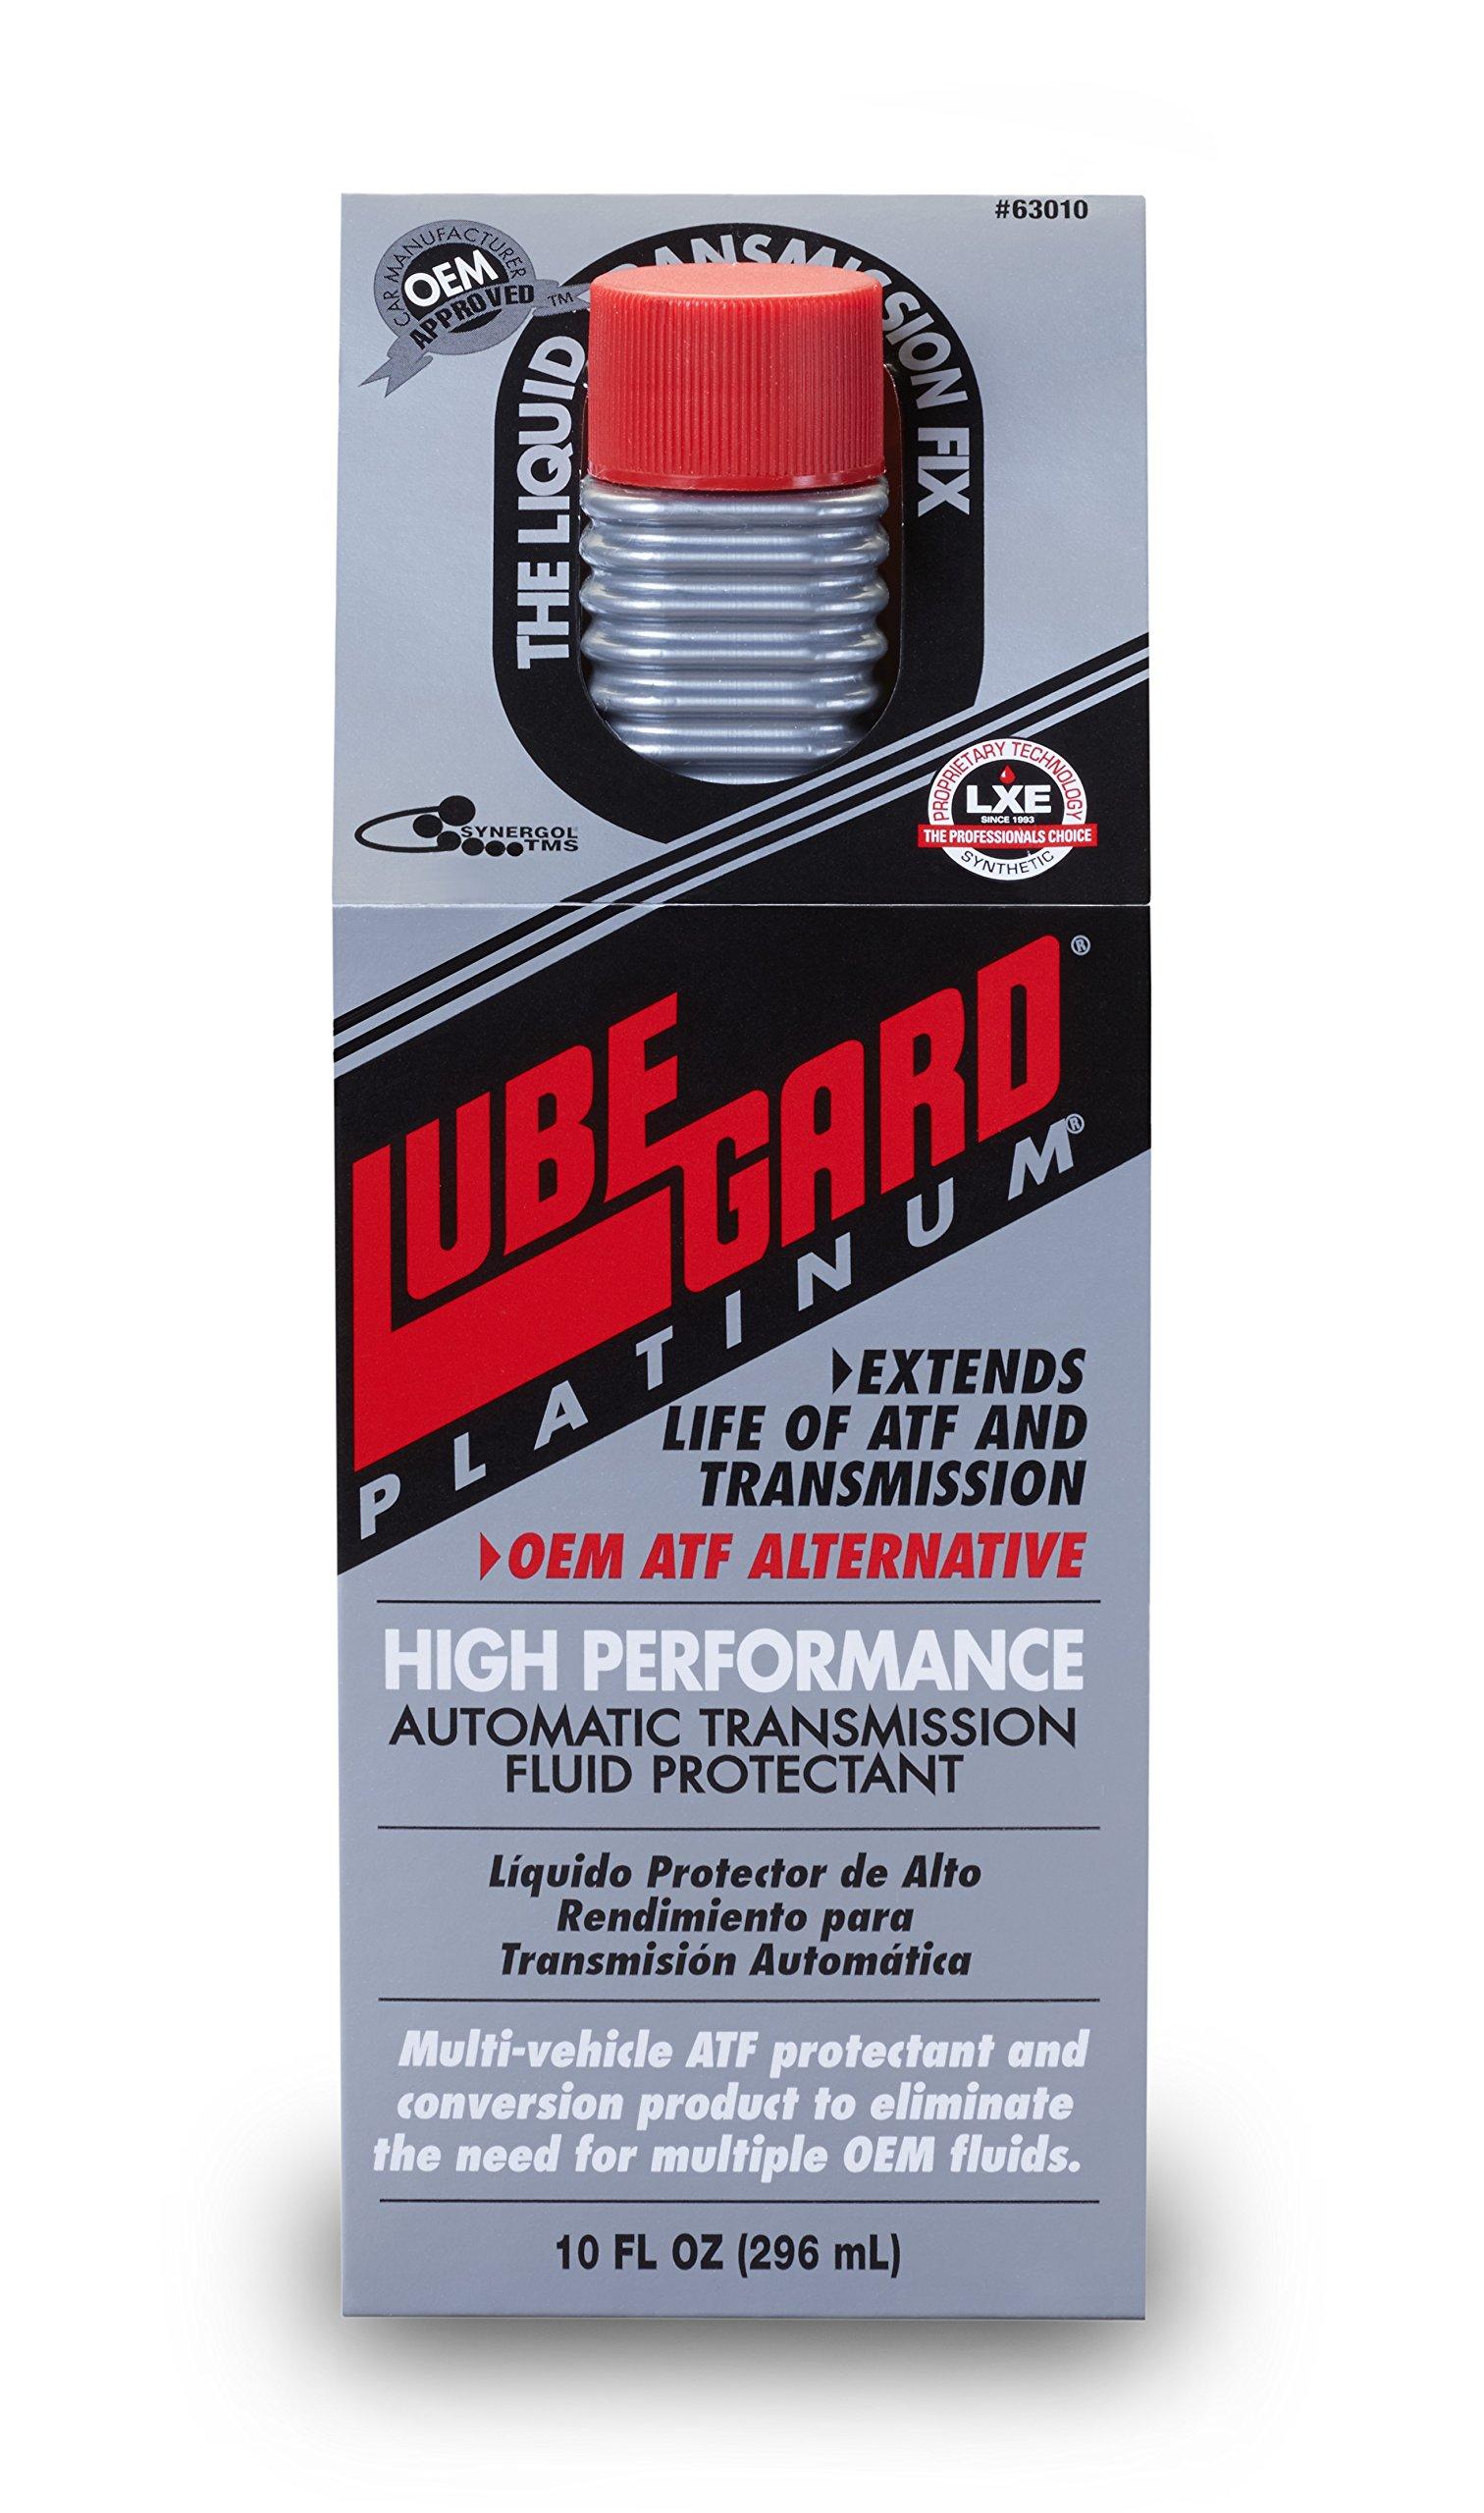 Lubegard 63010 Platinum Universal ATF Protectant, 10 oz. by Lubegard